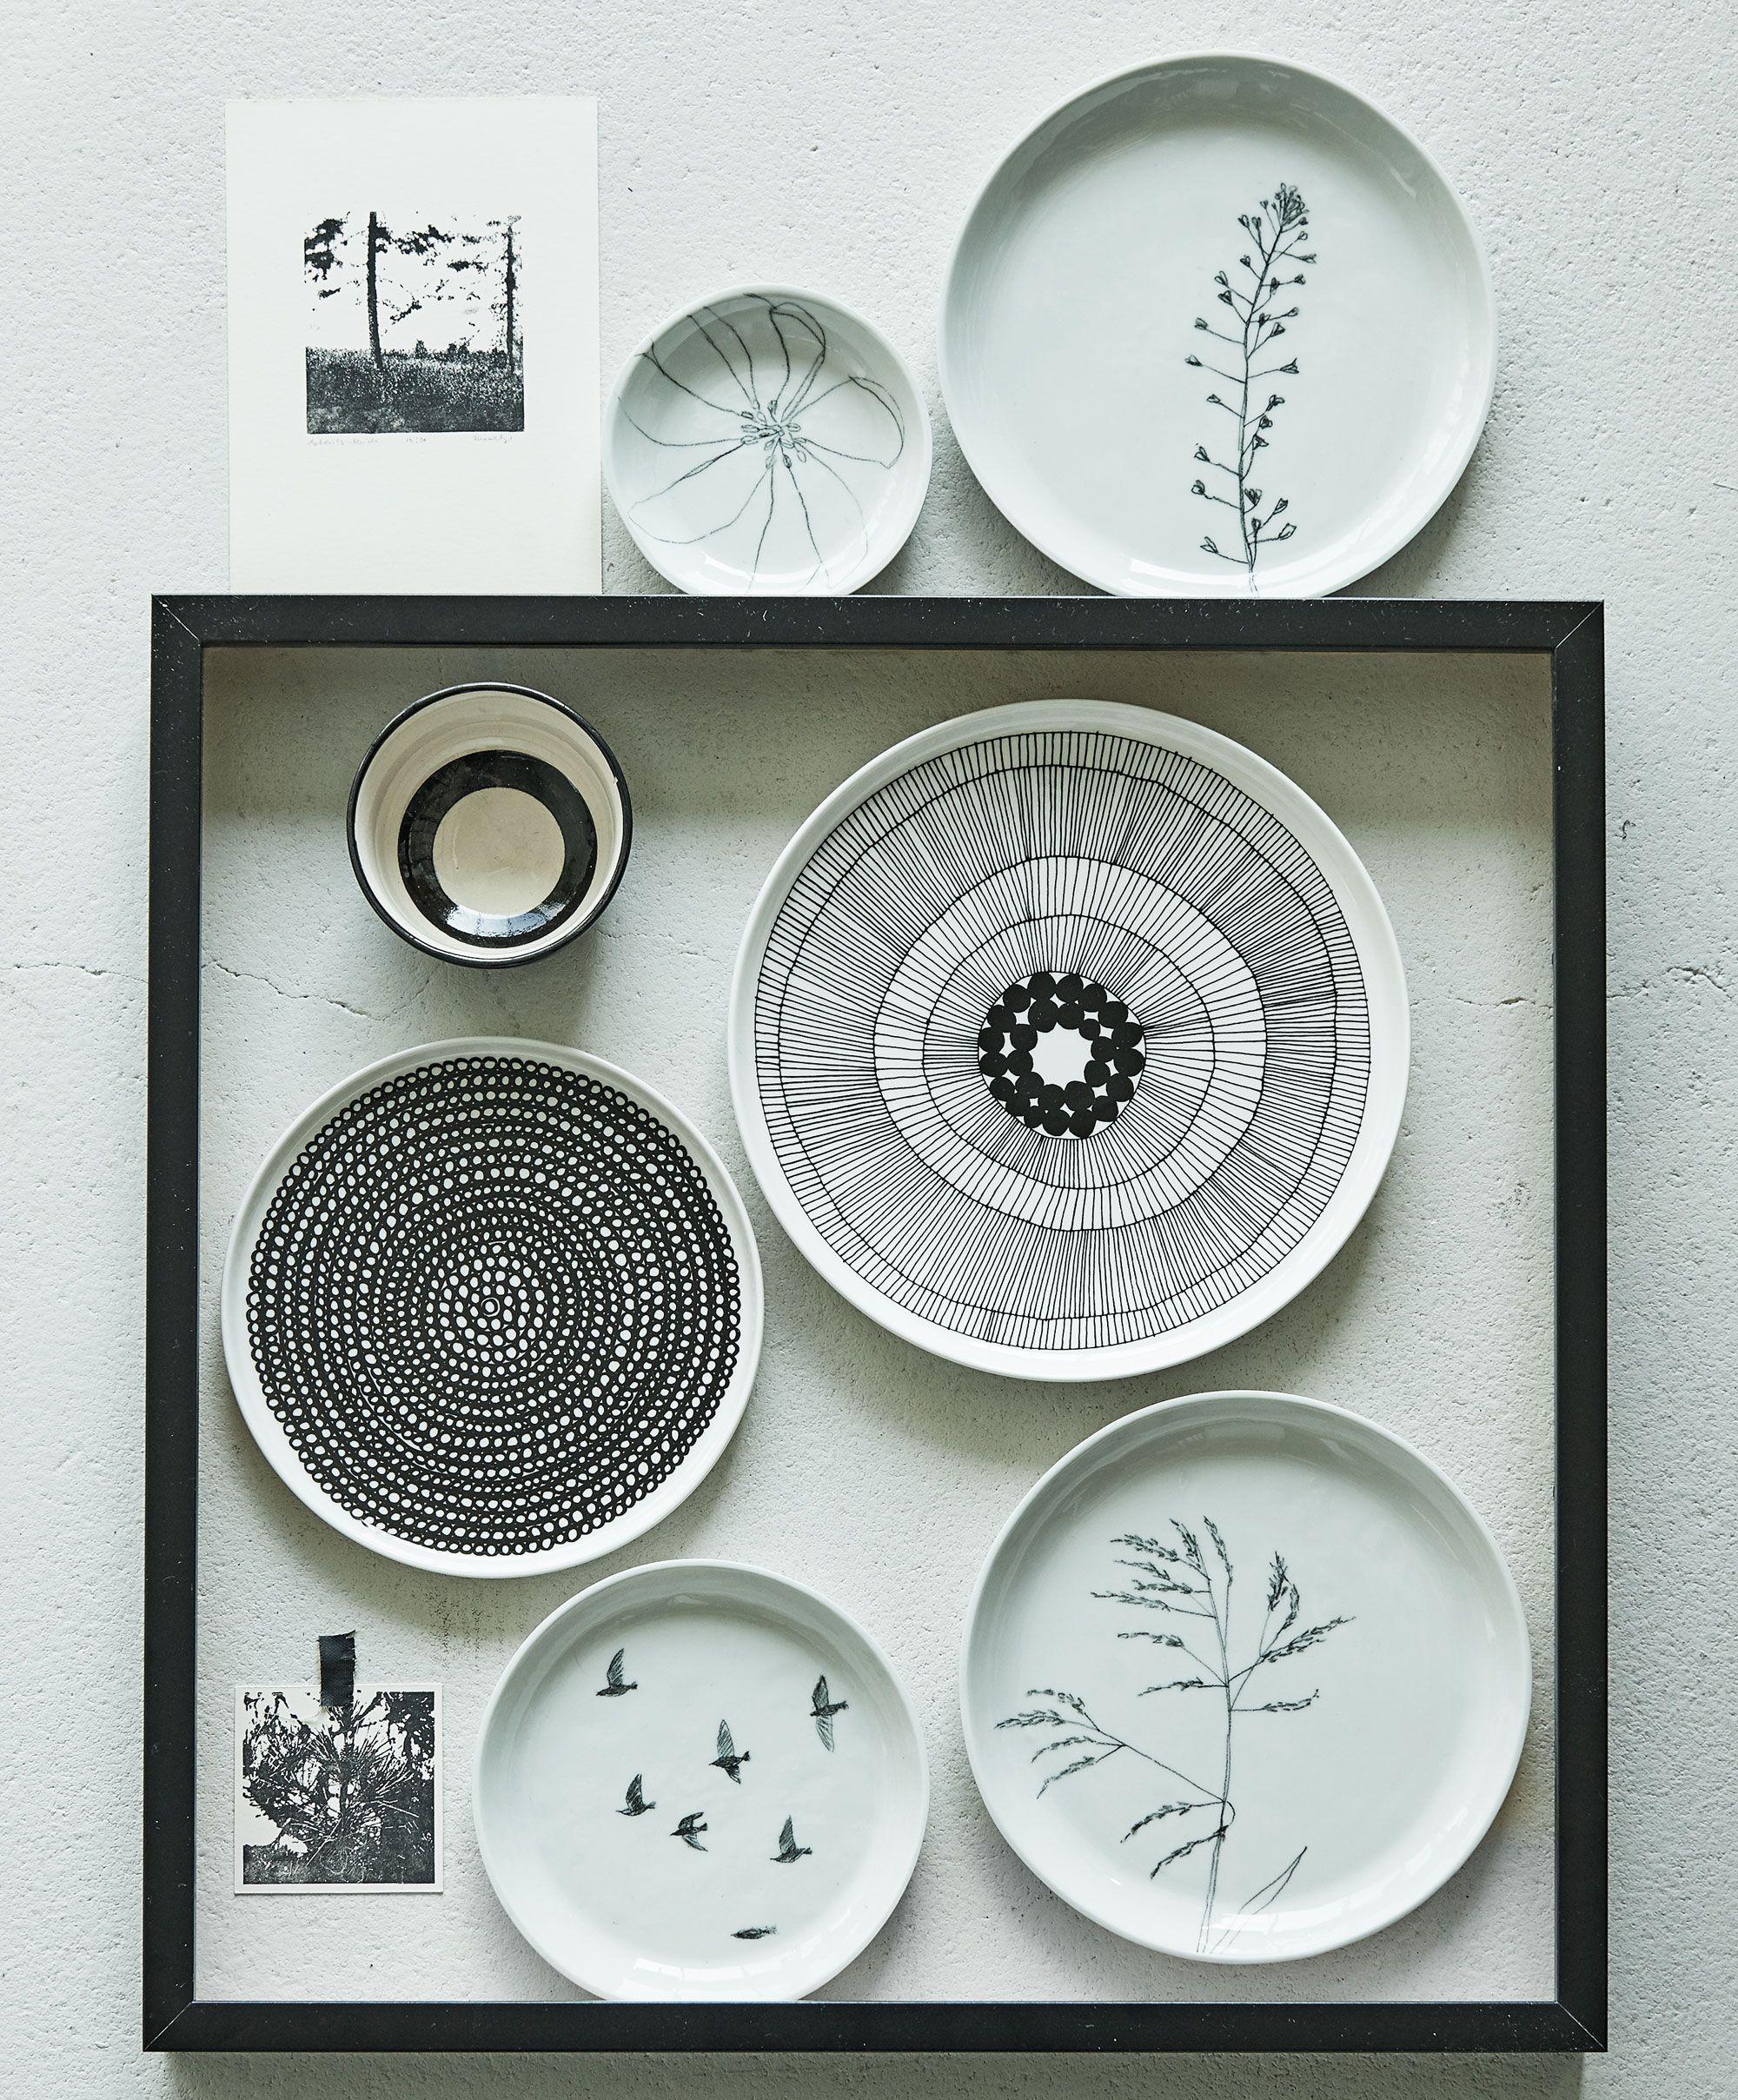 Foto Als Wanddecoratie.Borden Als Wanddecoratie Plates As Wall Decoration Photographer